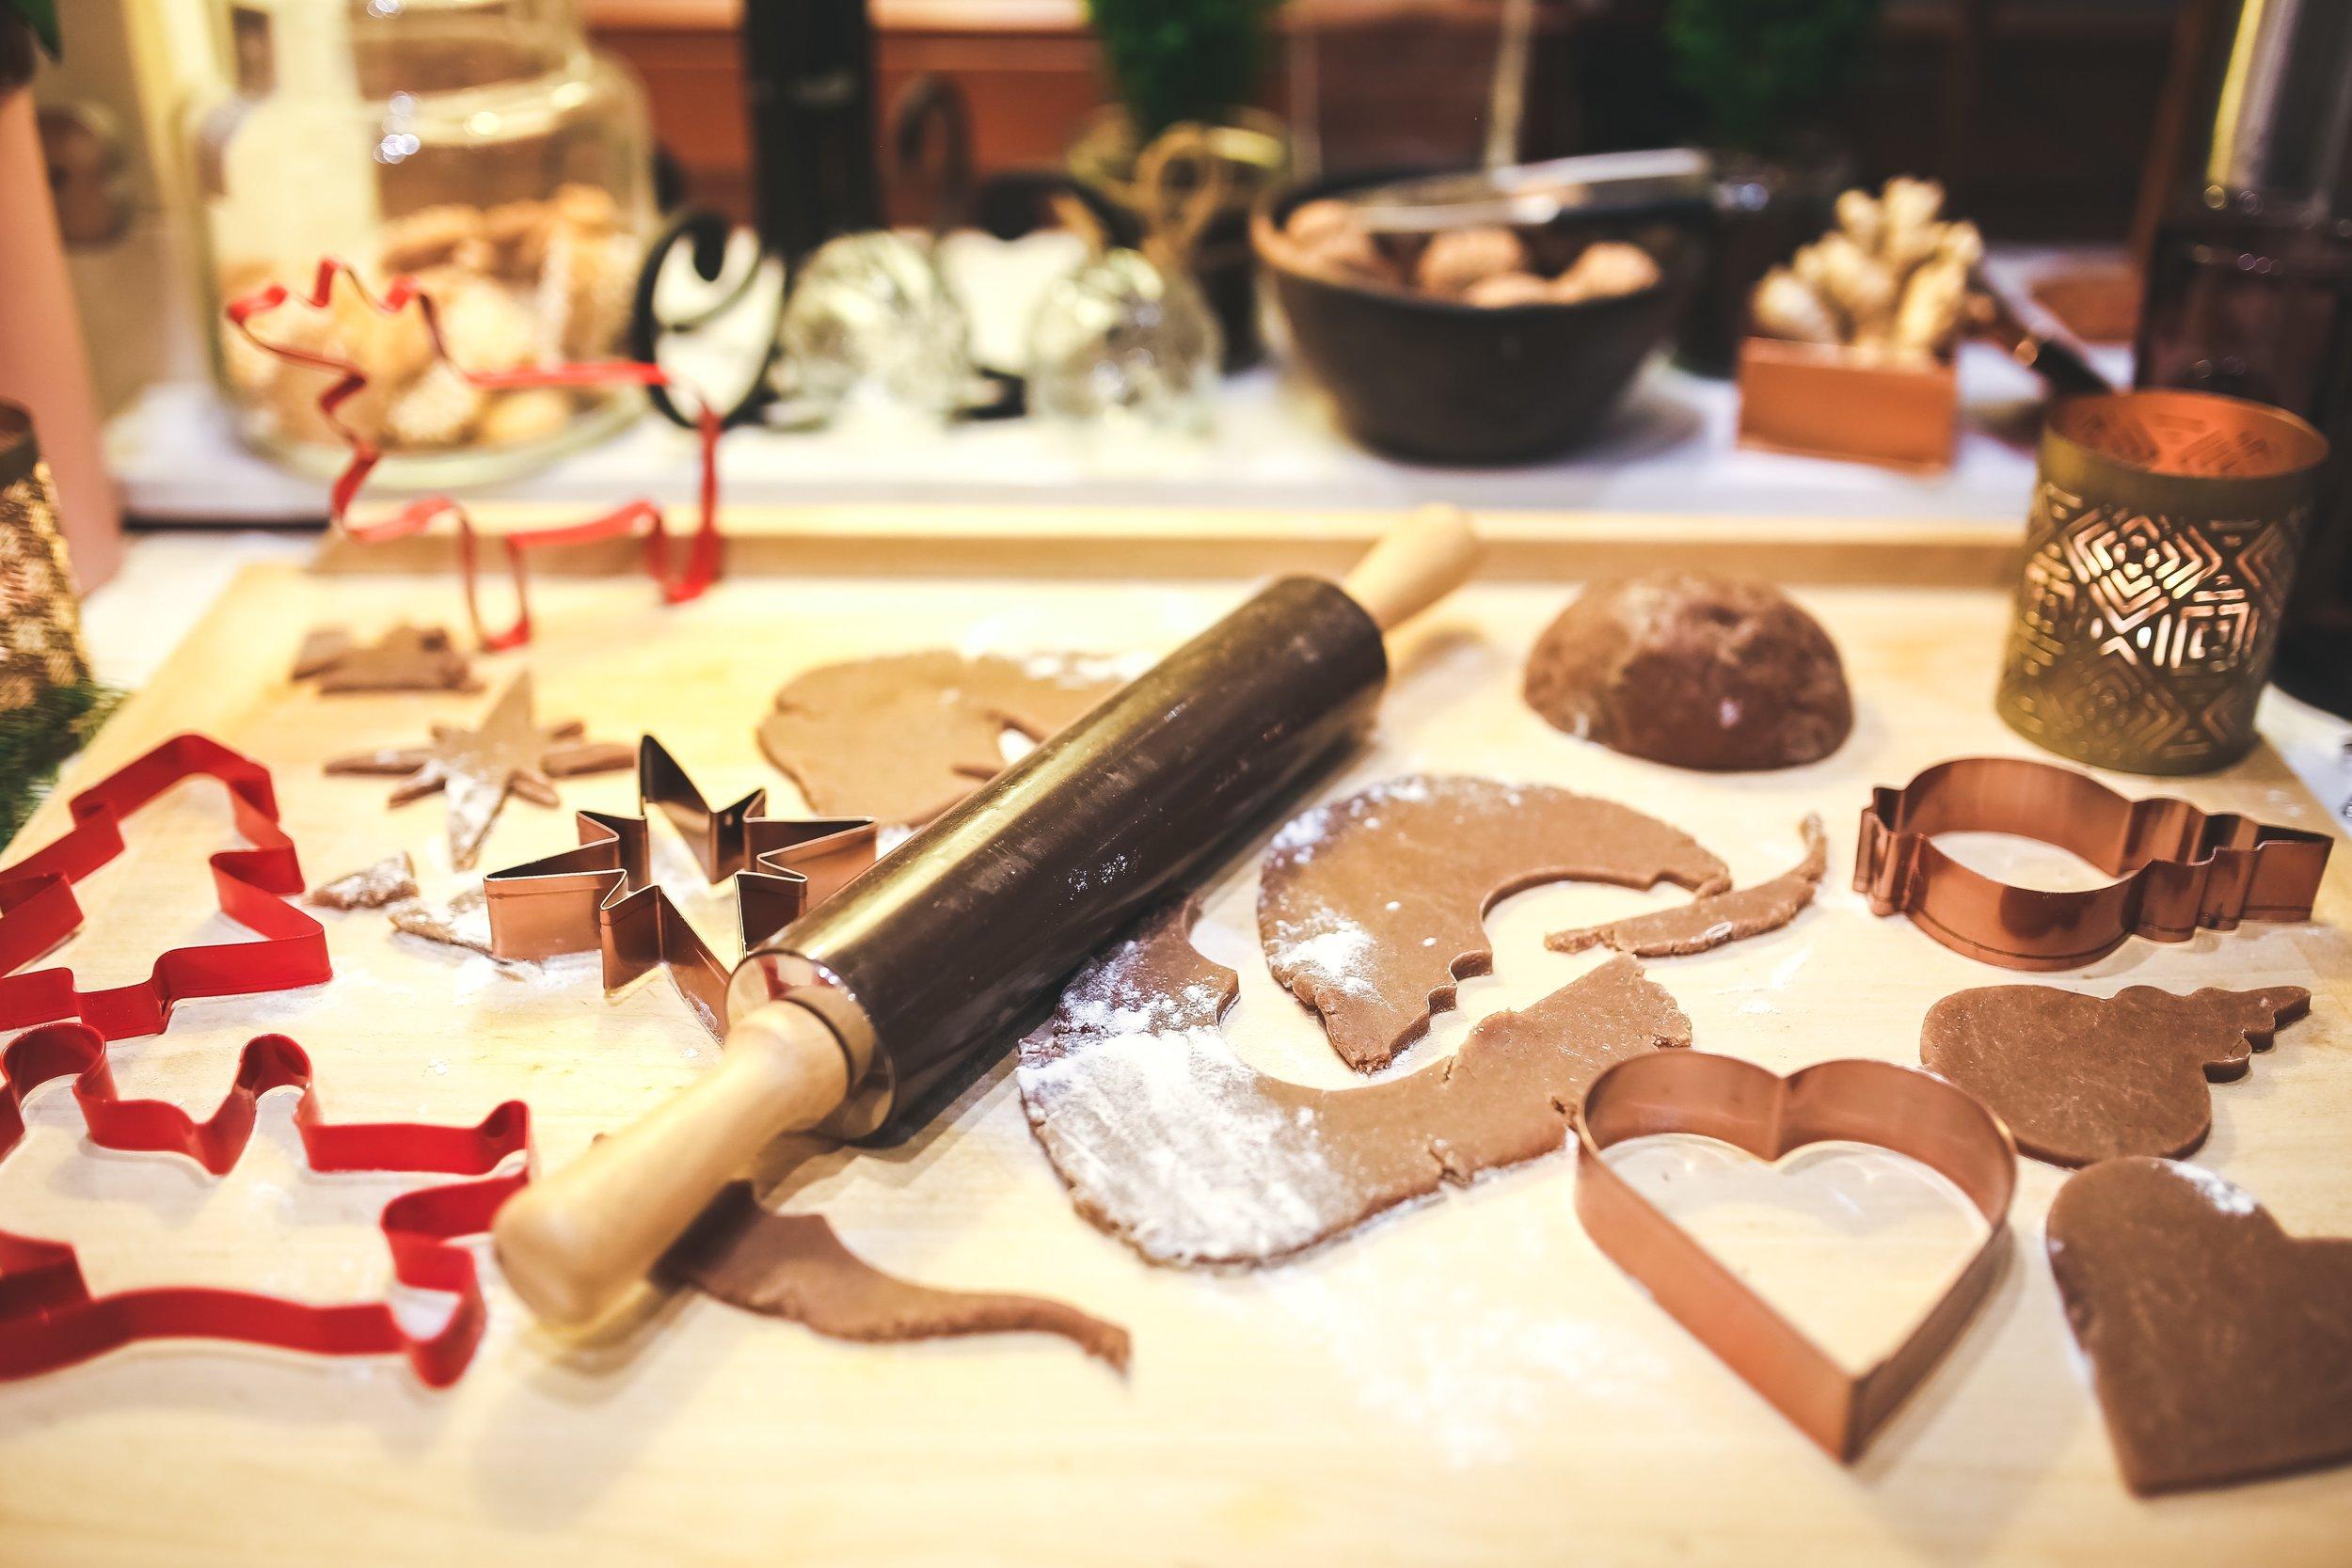 bakery-baking-biscuits-6293.jpg